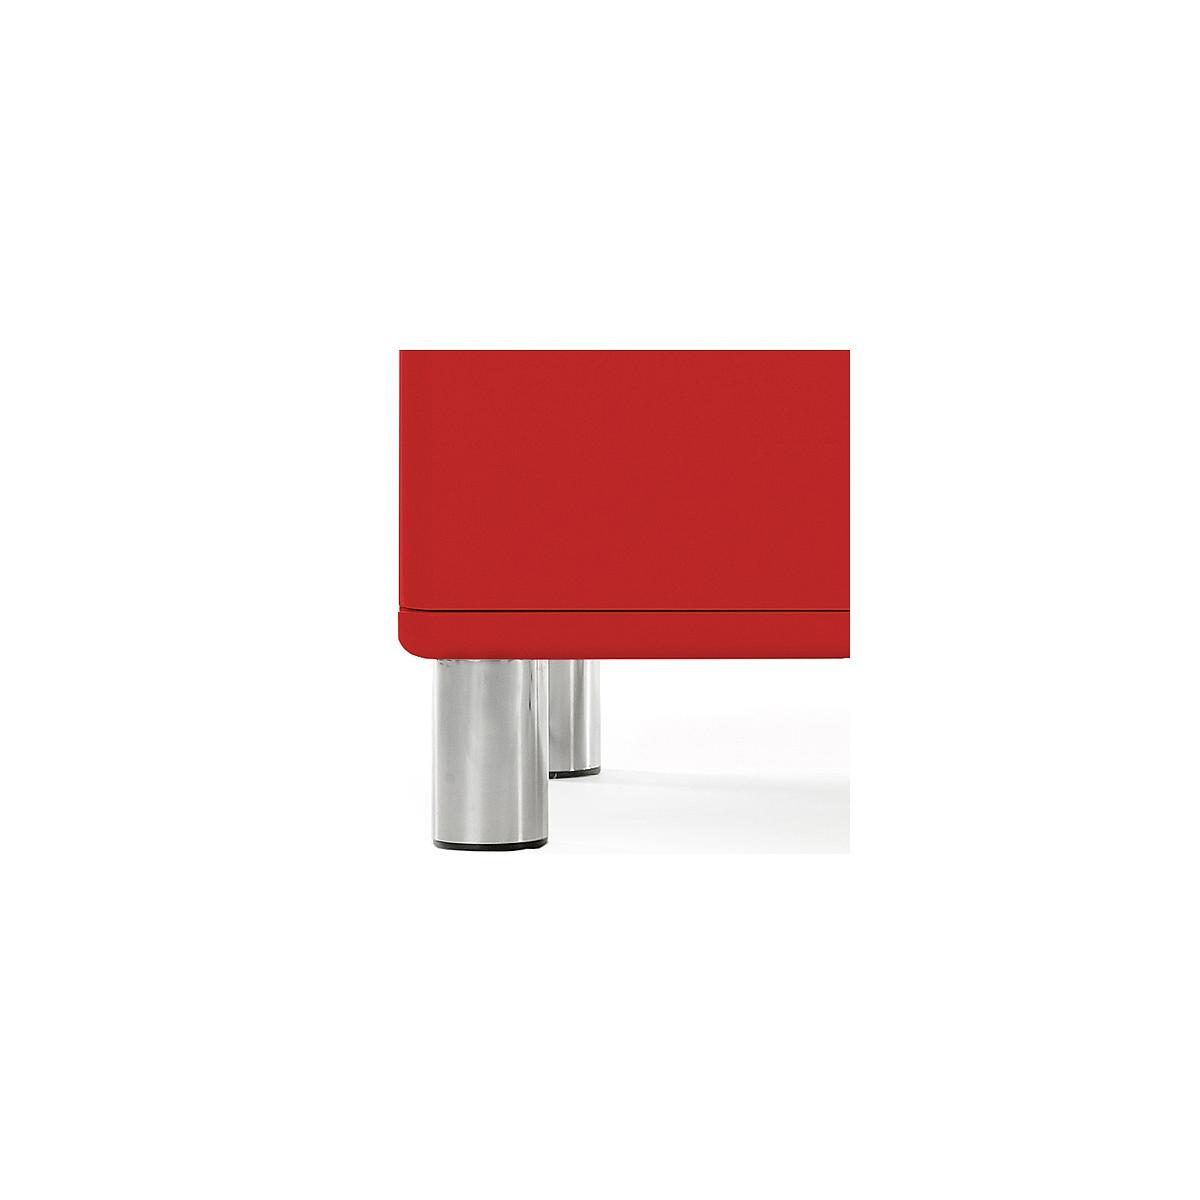 MALIBU by Tenzo Commode 2 portes et 1 tiroir - Rouge